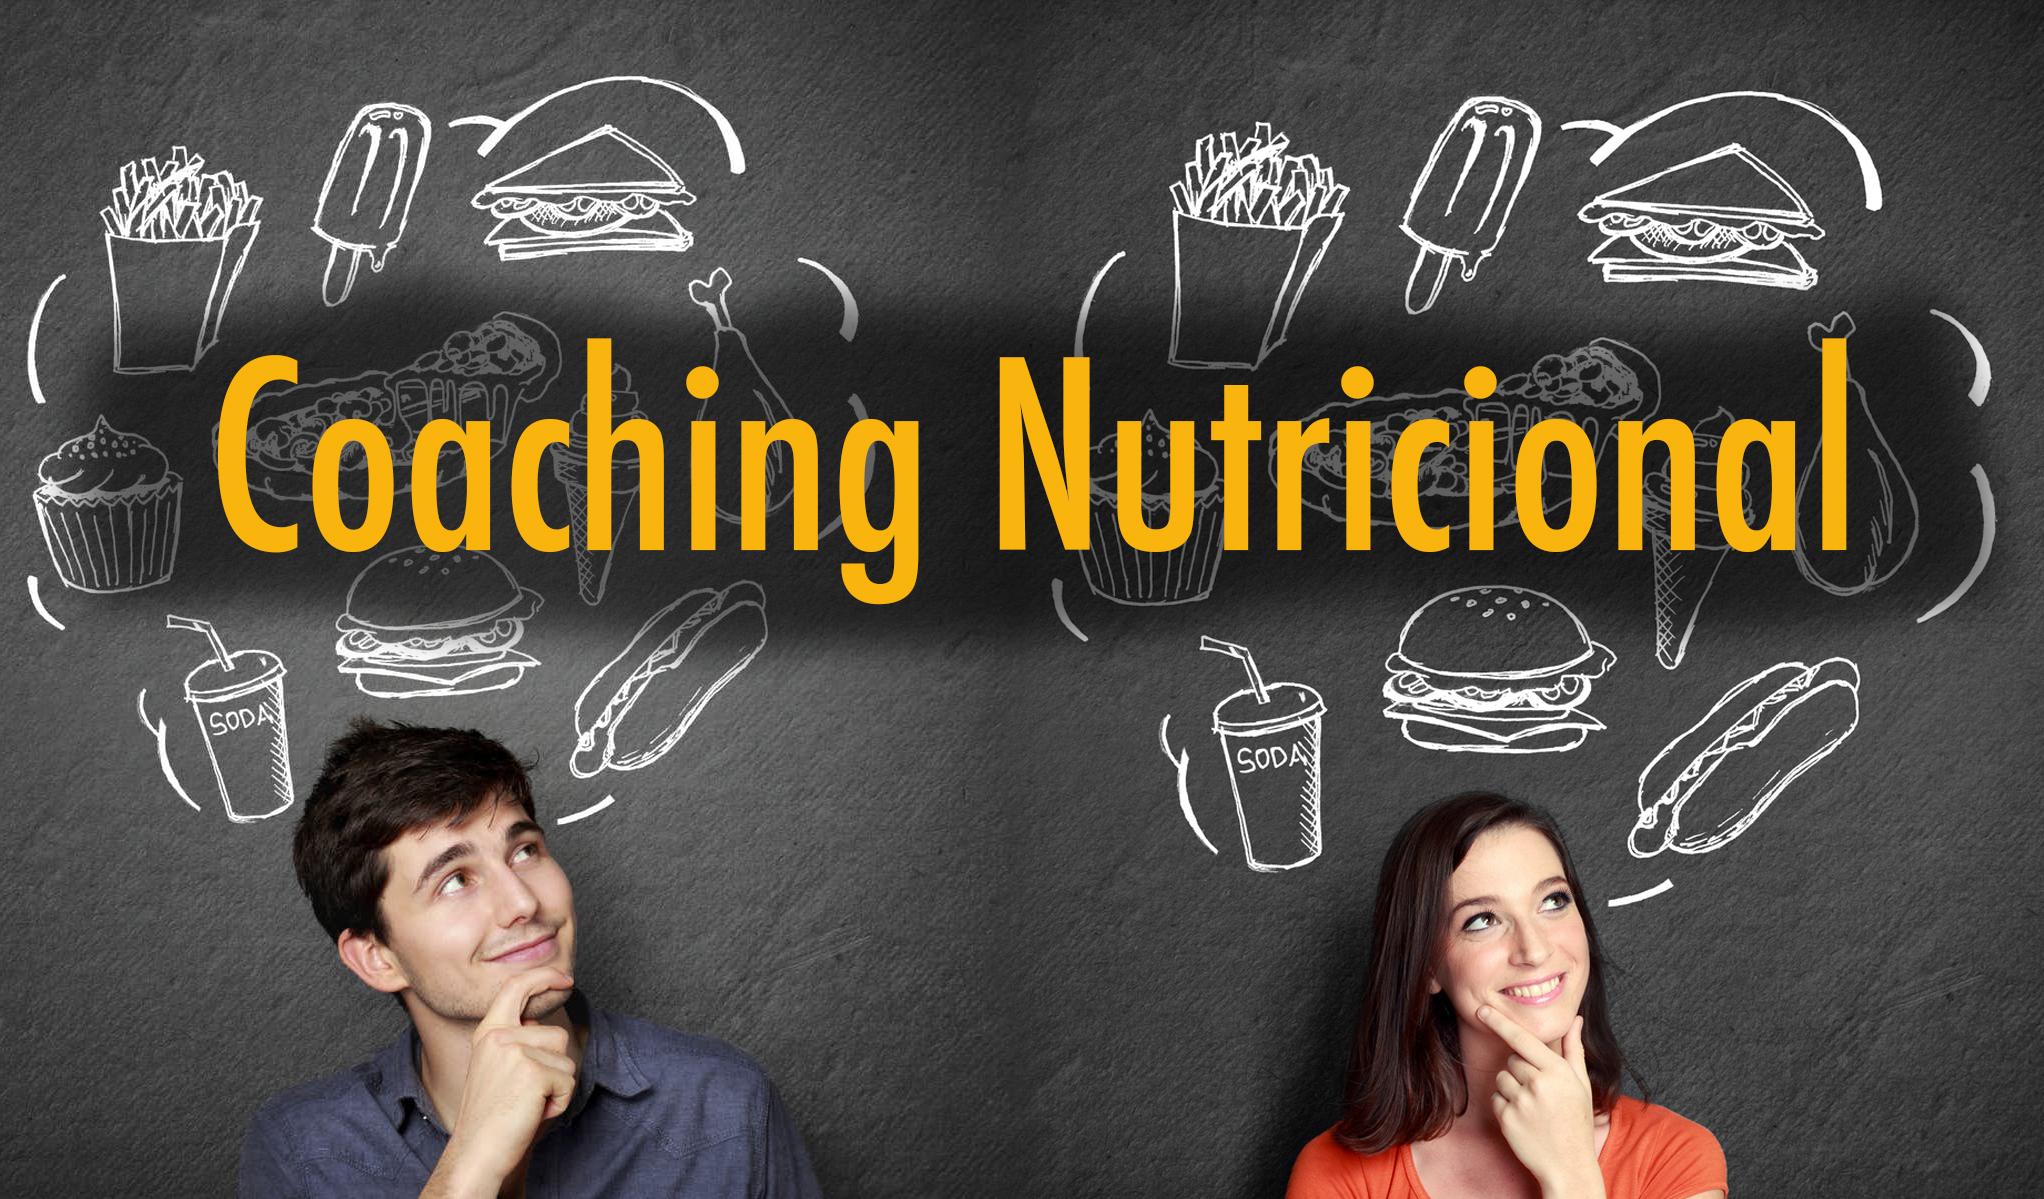 coach nutricional promo